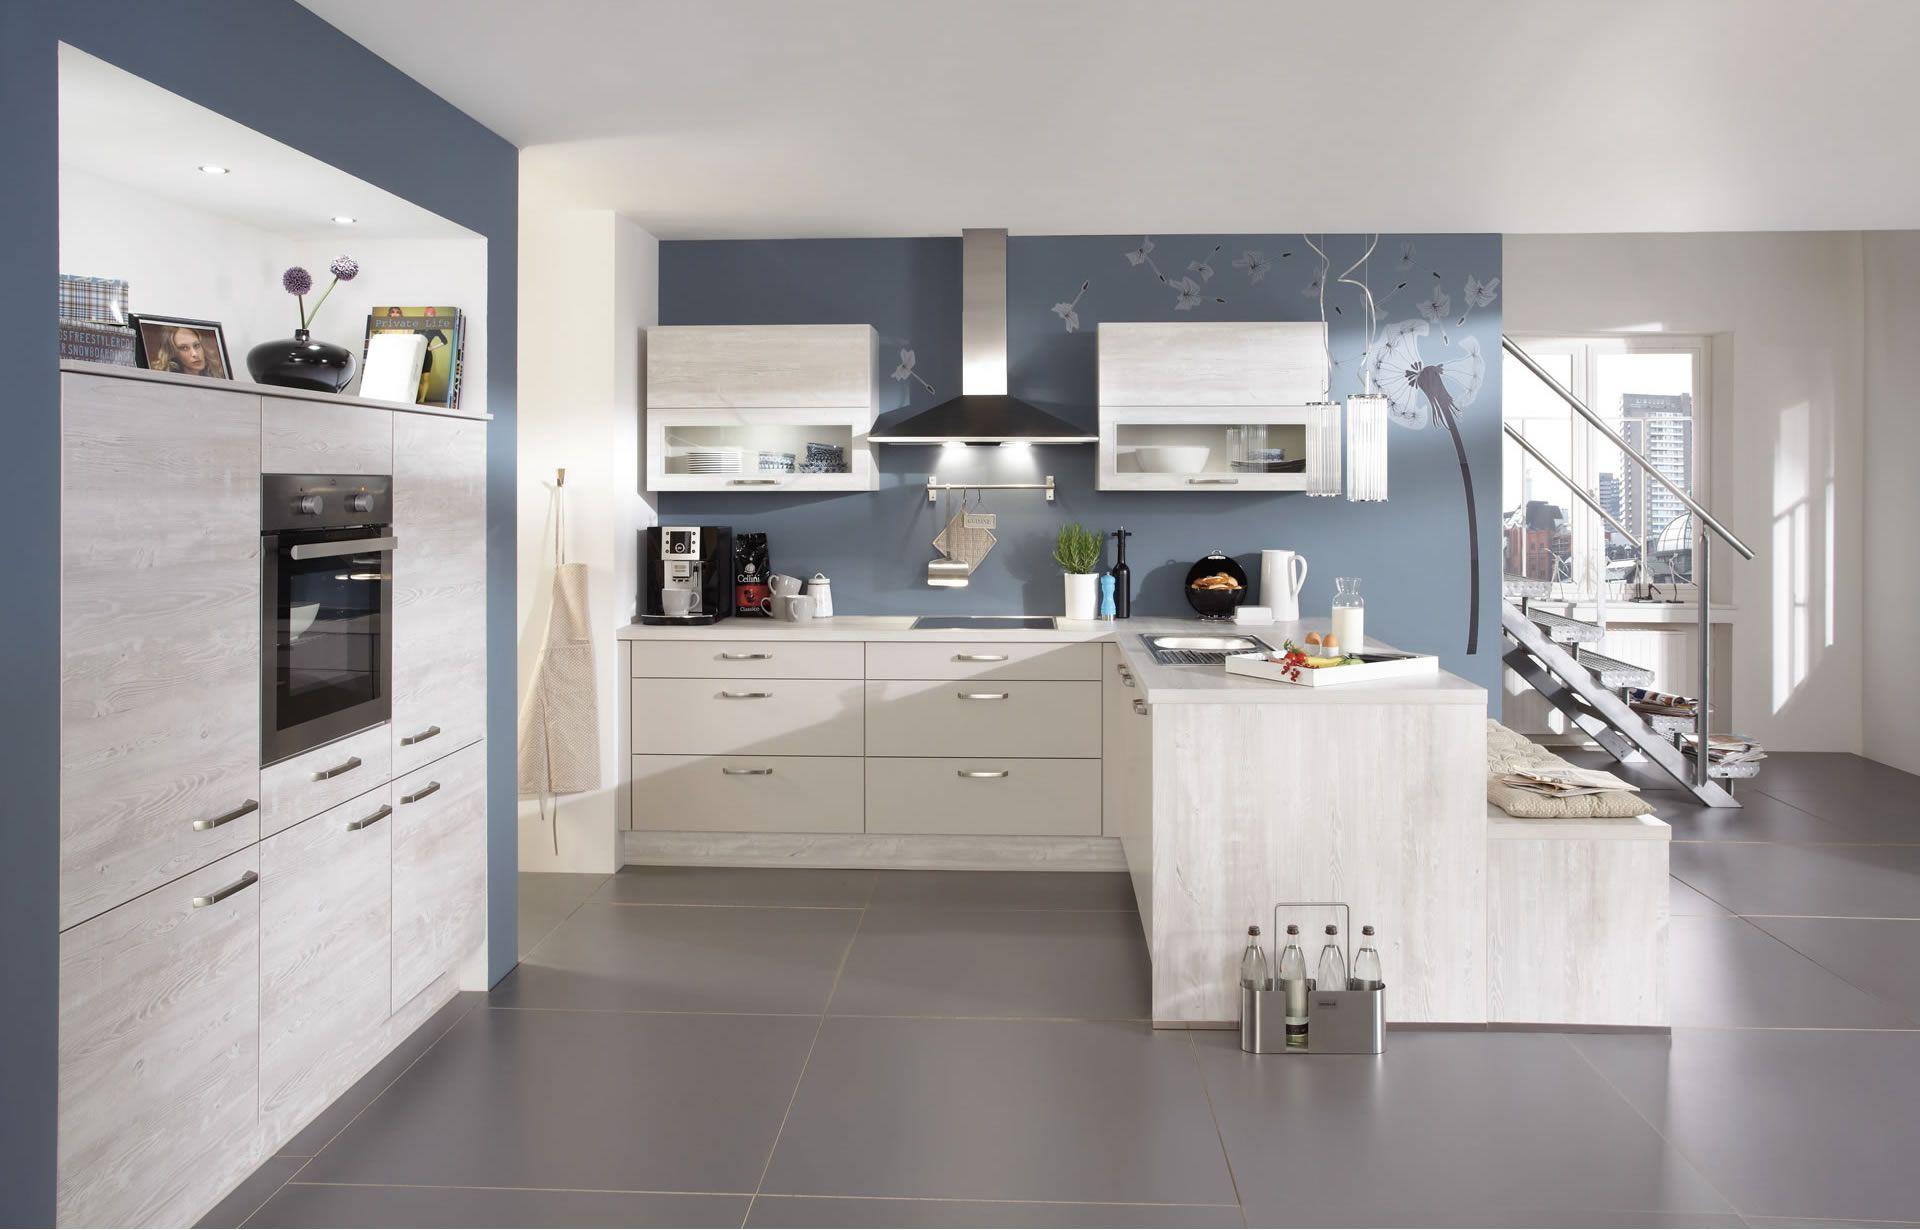 Explore Modern Kitchen Designs, Modern Kitchens, And More!